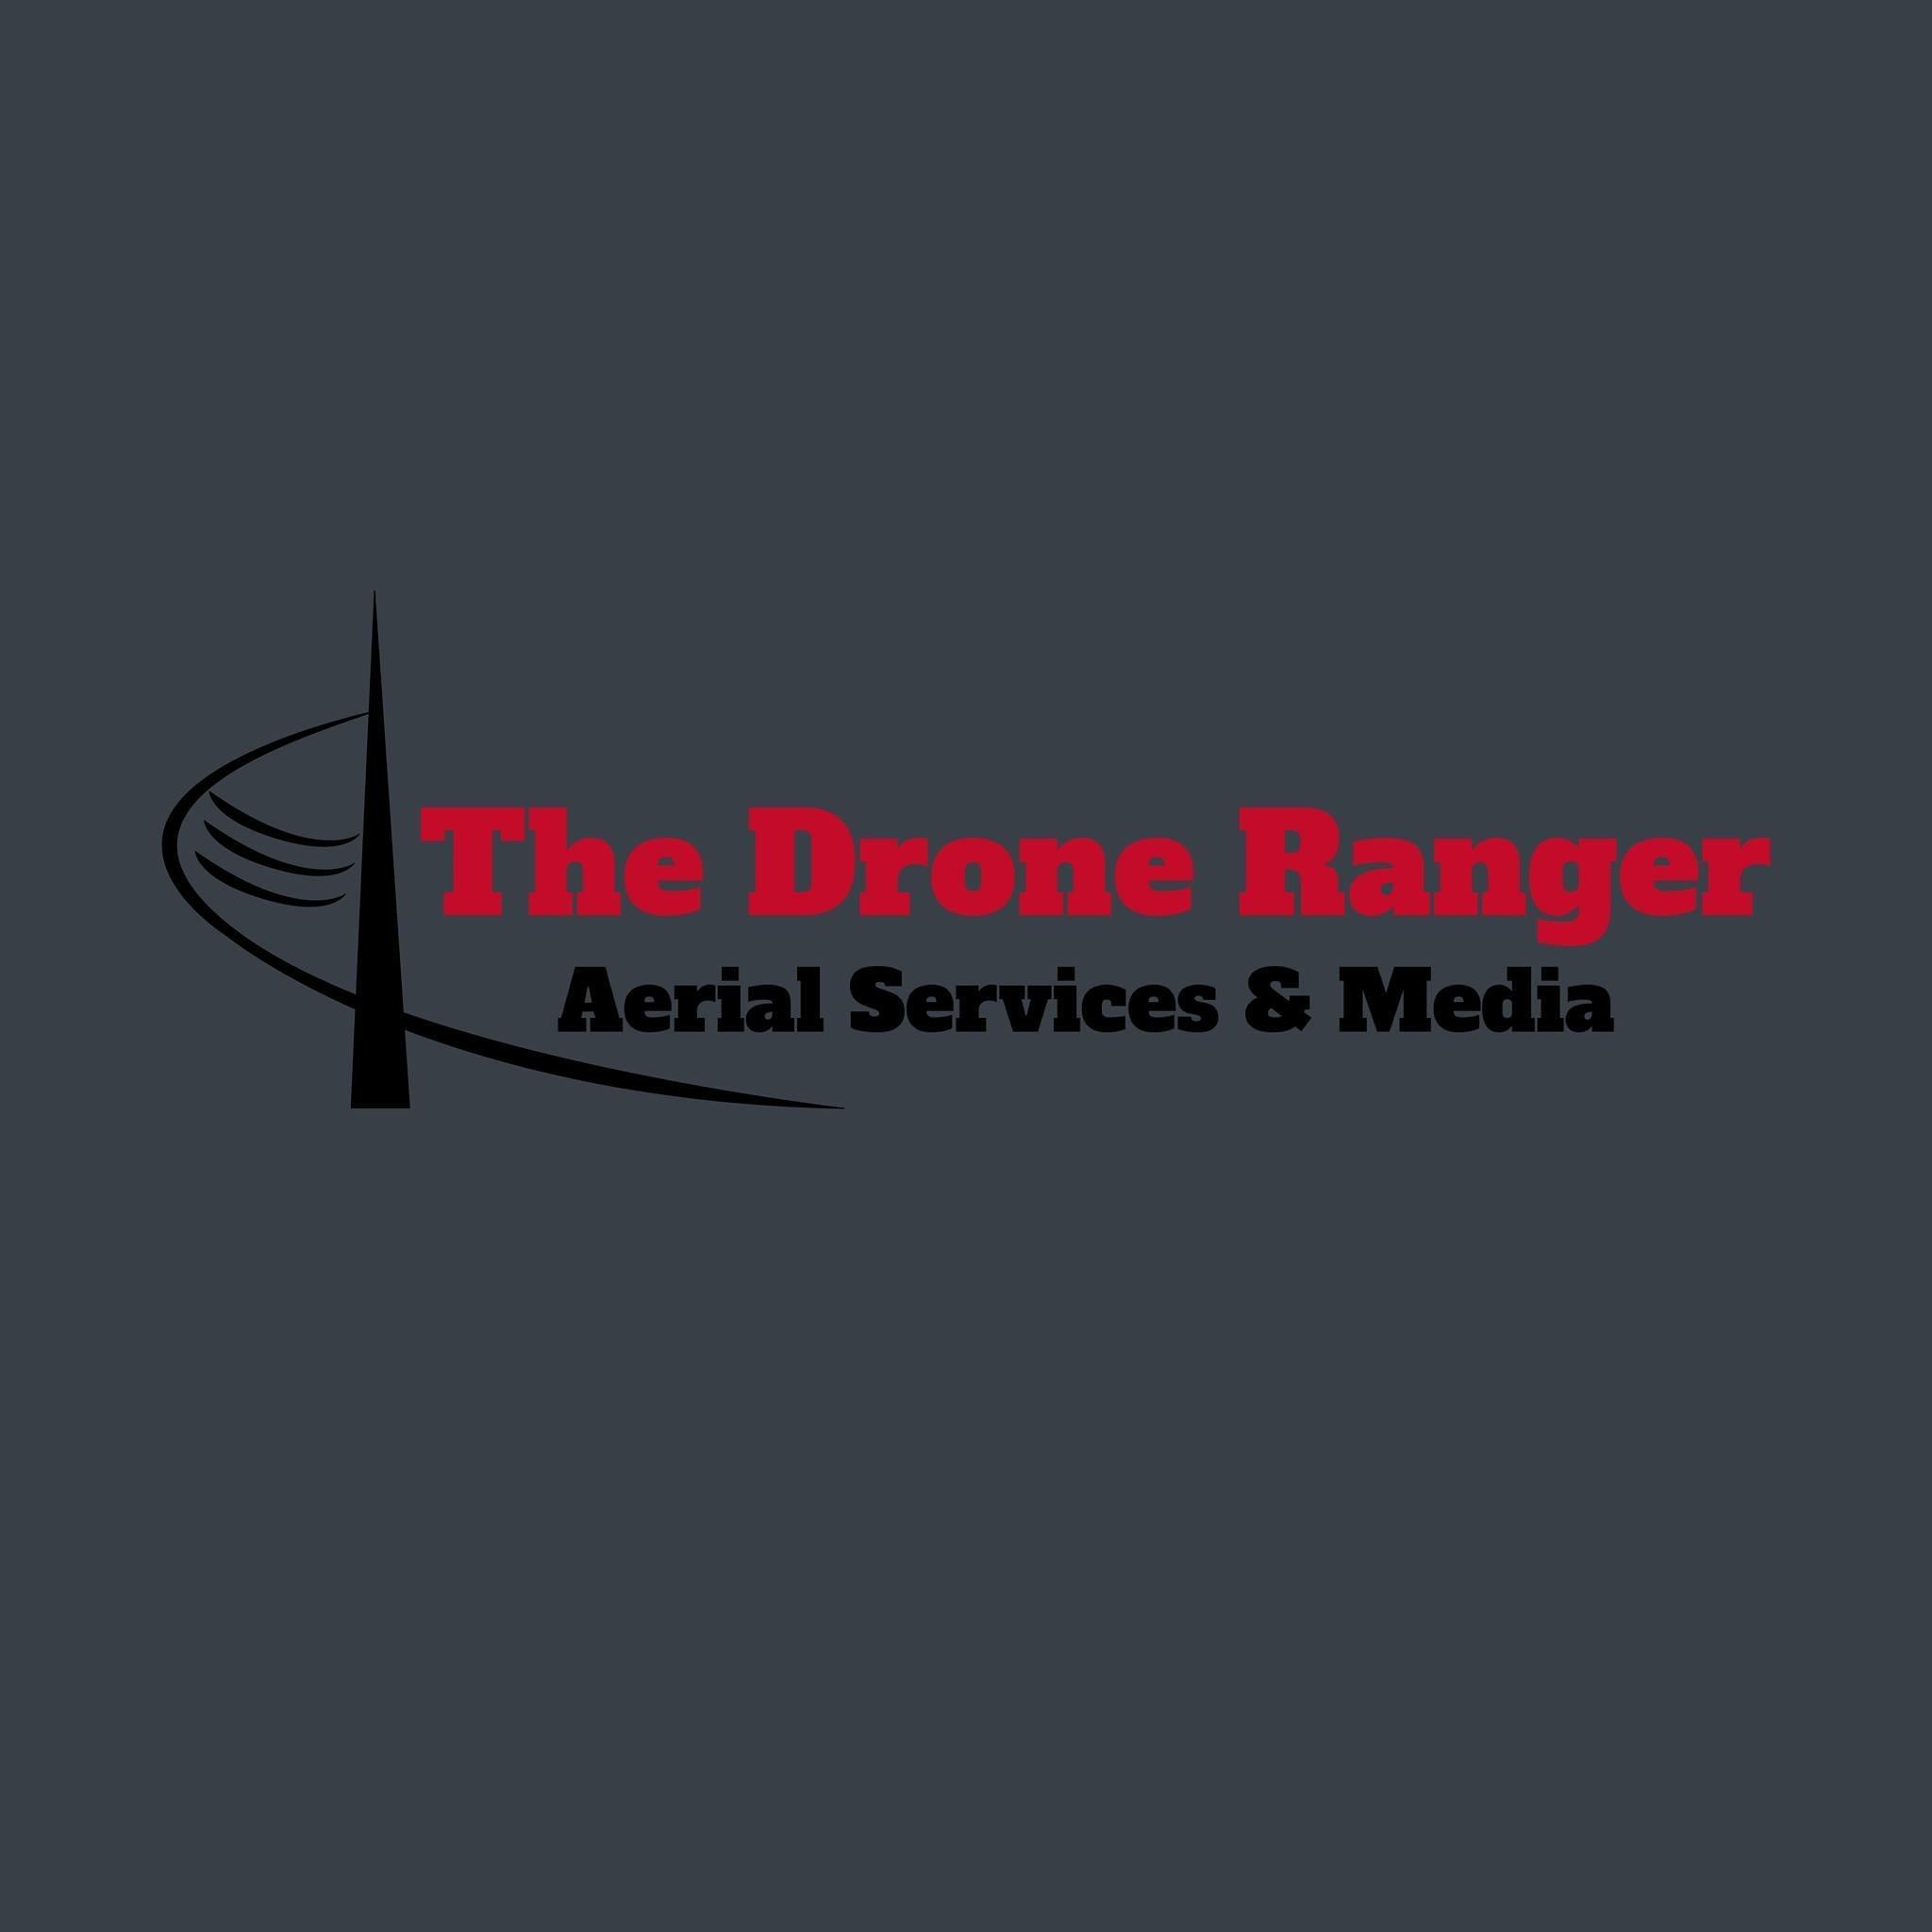 The Drone Ranger Ltd